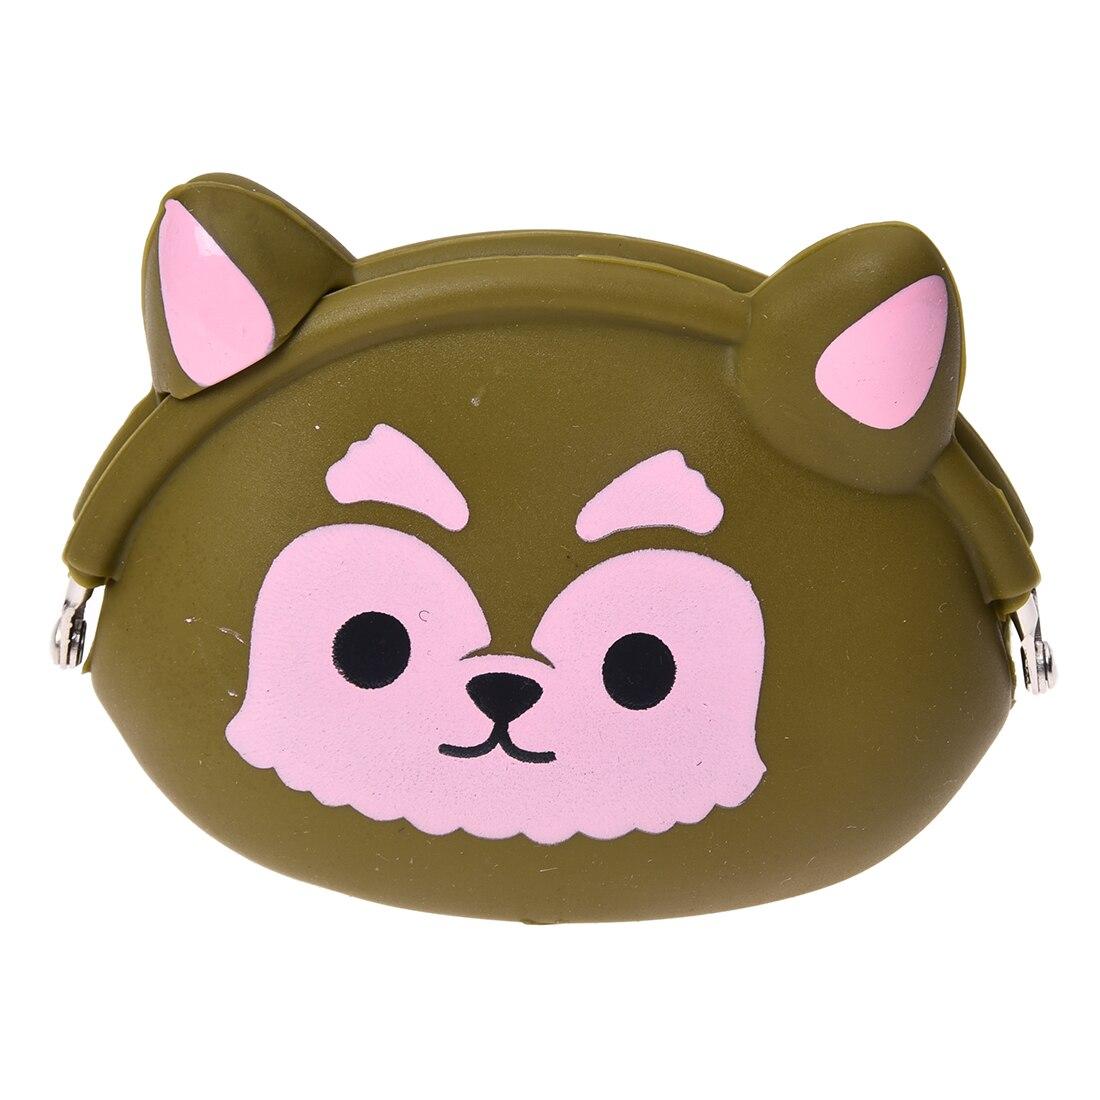 5pcs of Women Girls Wallet Kawaii Cute Cartoon Animal Silicone Jelly Coin Bag Purse Kids Gift Green dogs